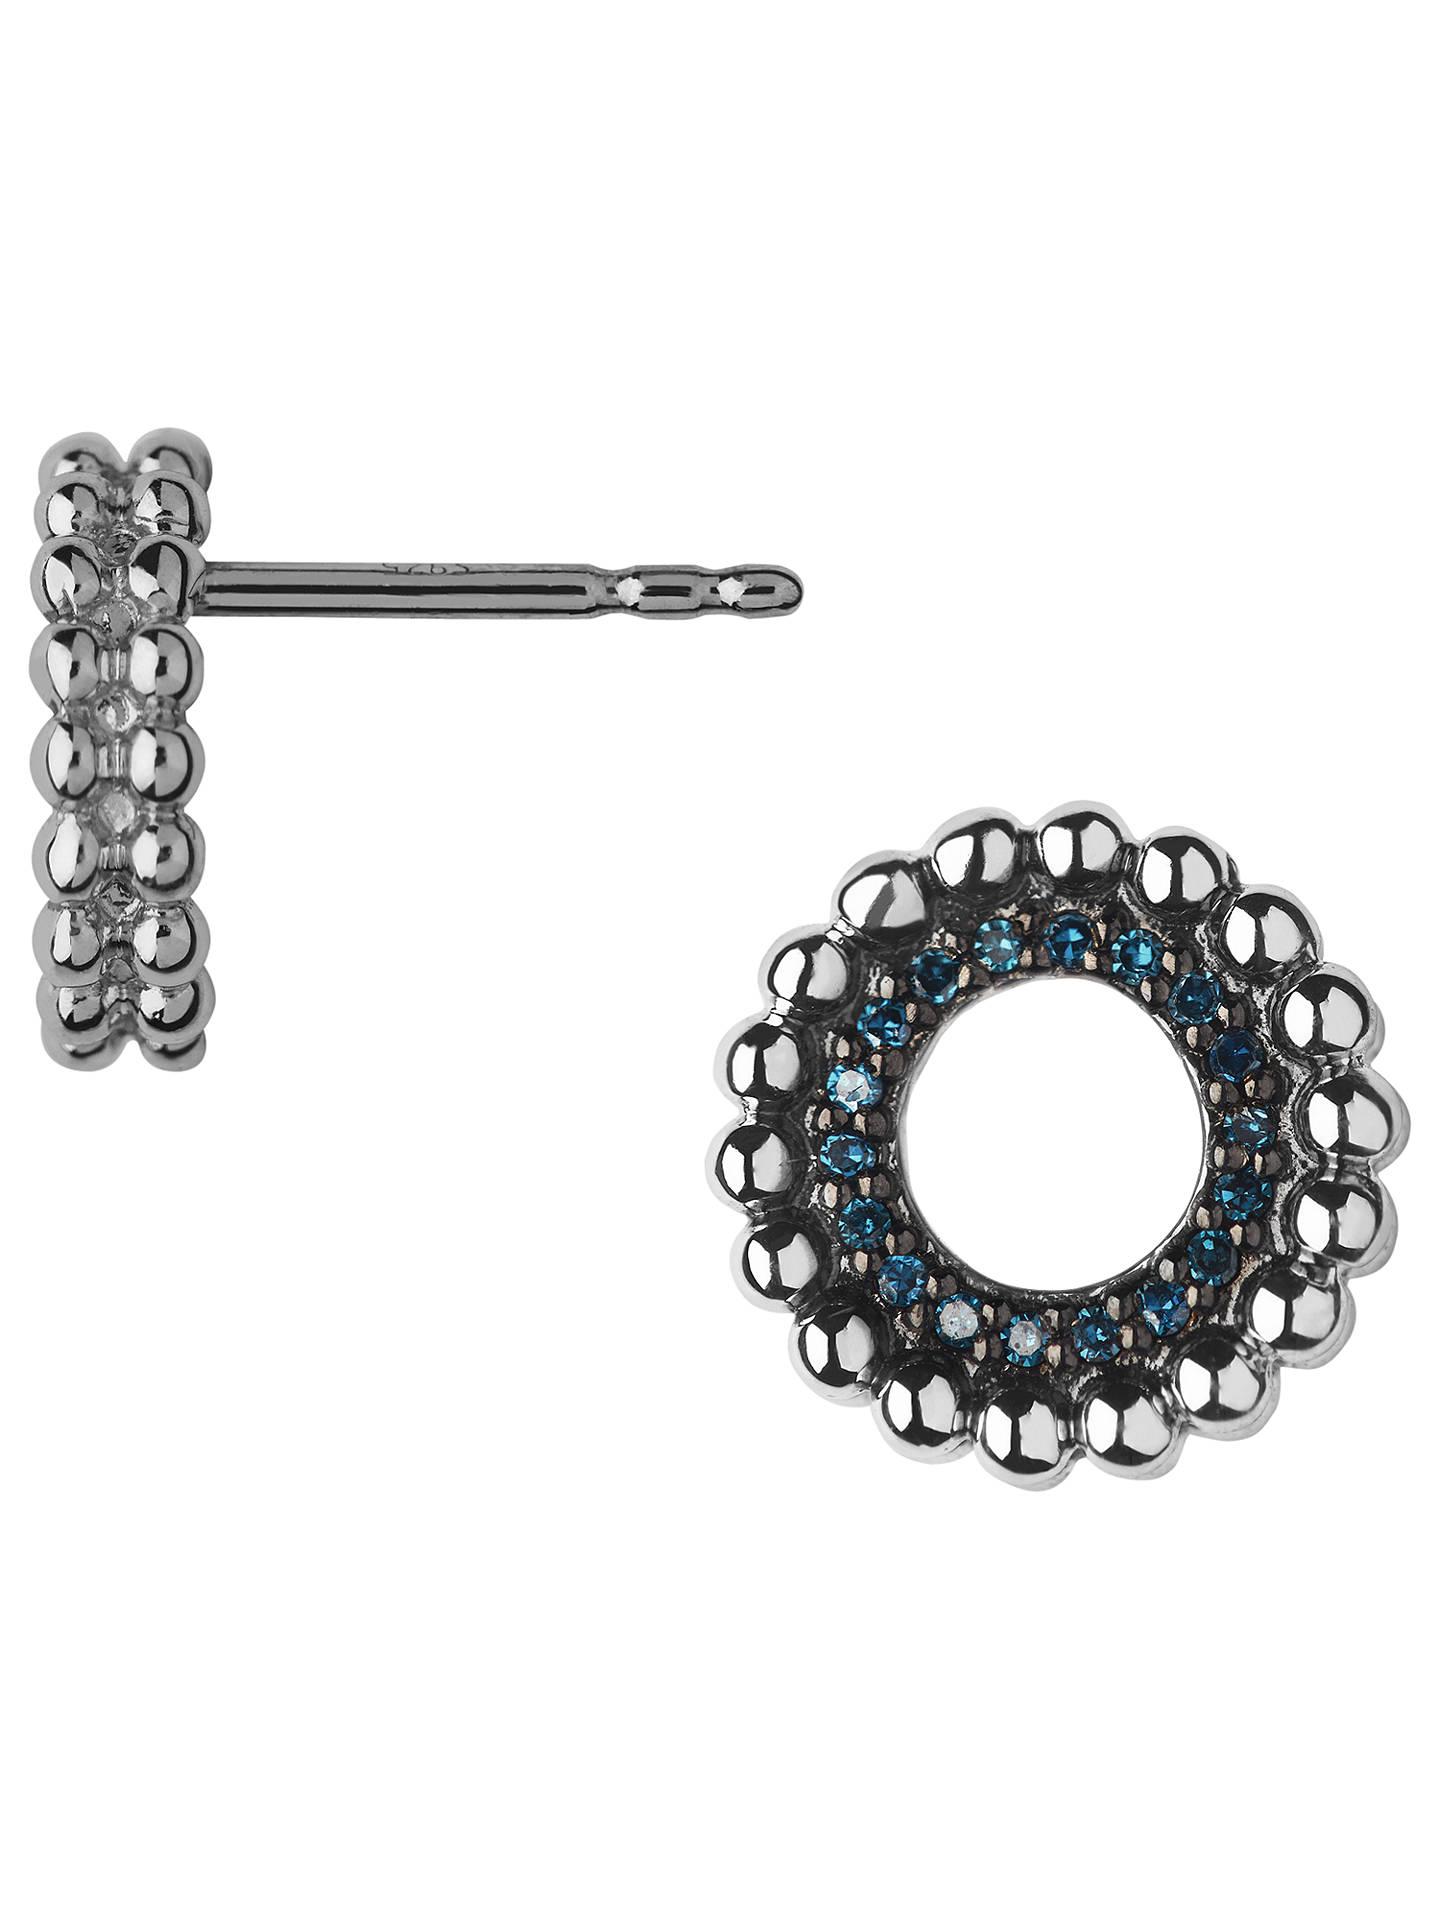 6b76734d9 Buy Links of London Effervescence Diamond Pave Stud Earrings, Silver/Blue  Online at johnlewis ...